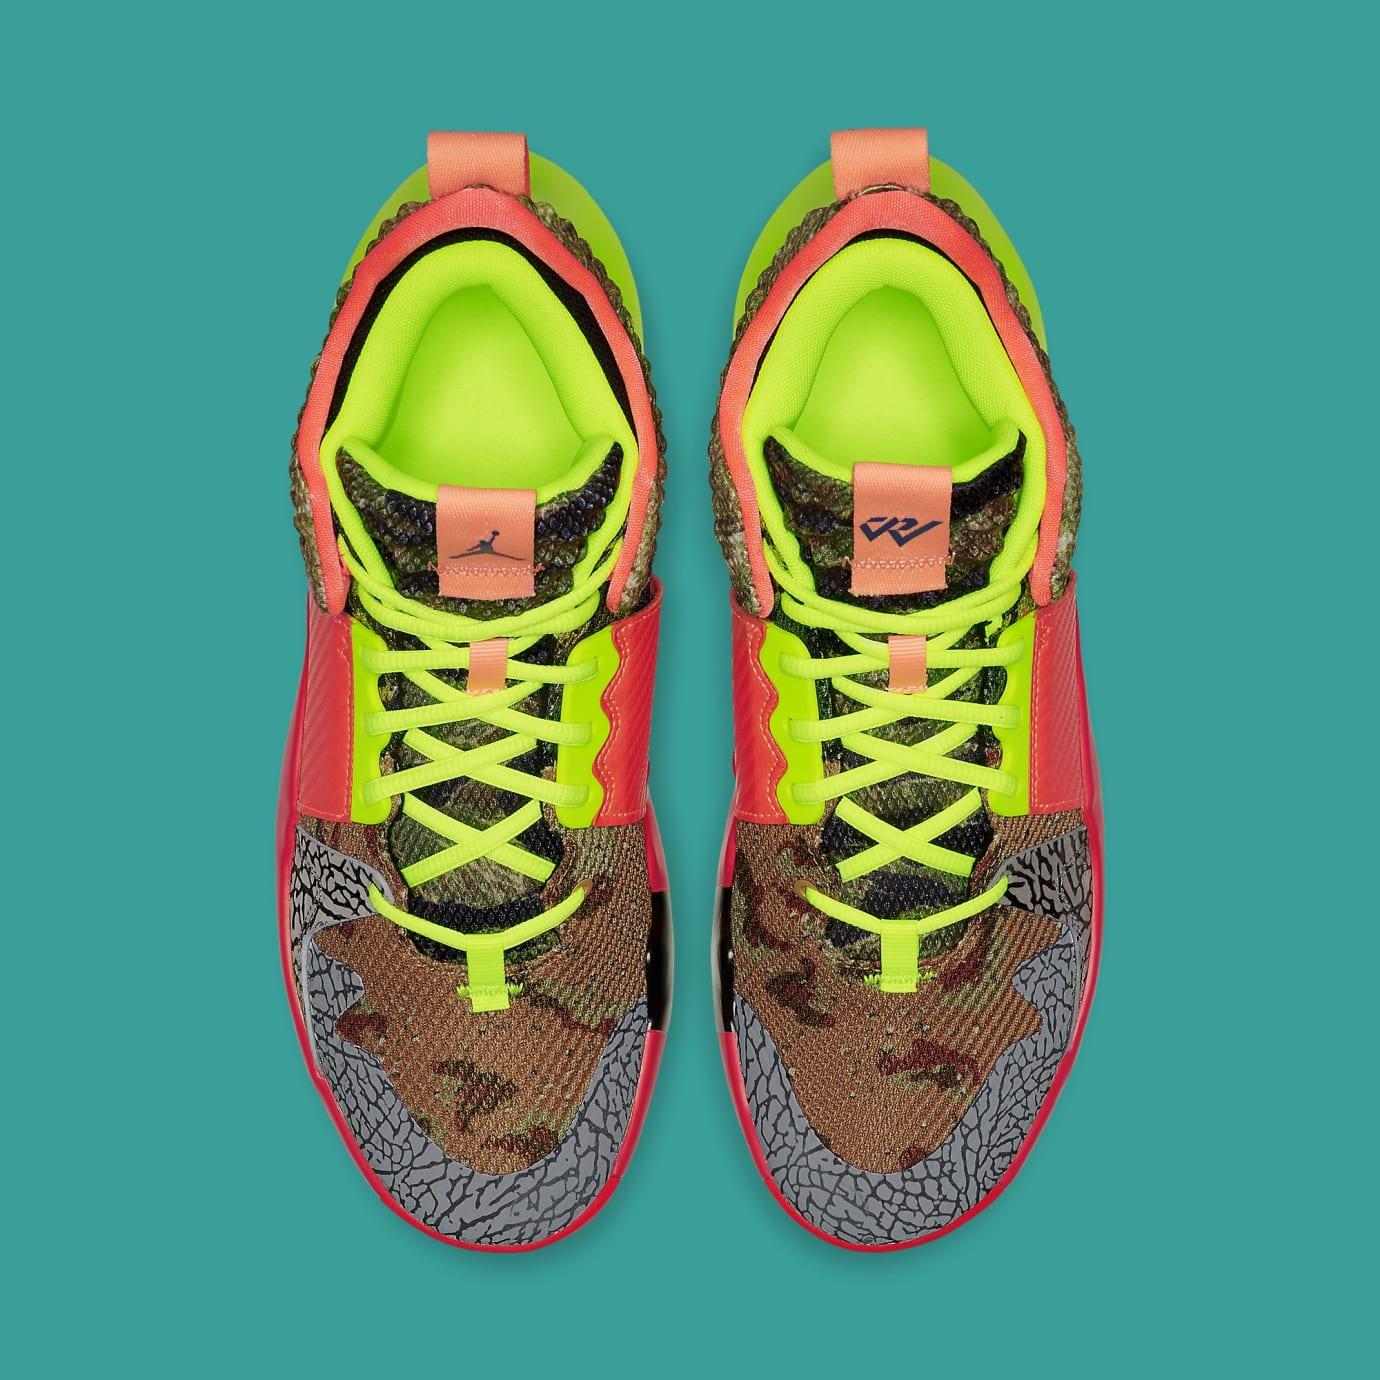 e5f499075199b3 Jordan Why Not Zer0.2  All-Star  Camo Green Hyper Turquoise-Volt ...